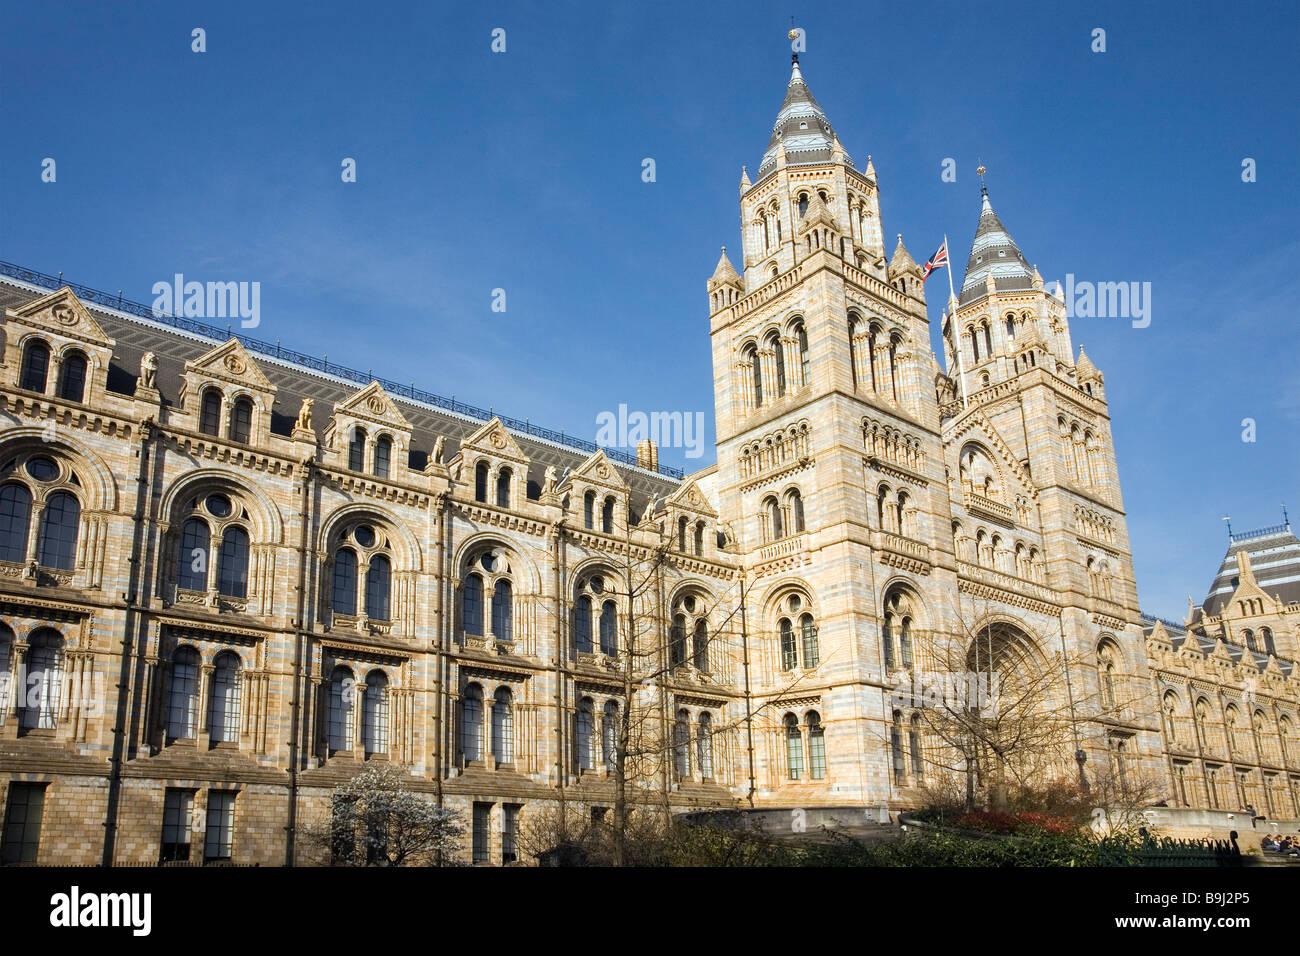 Natural History Museum, London - Stock Image